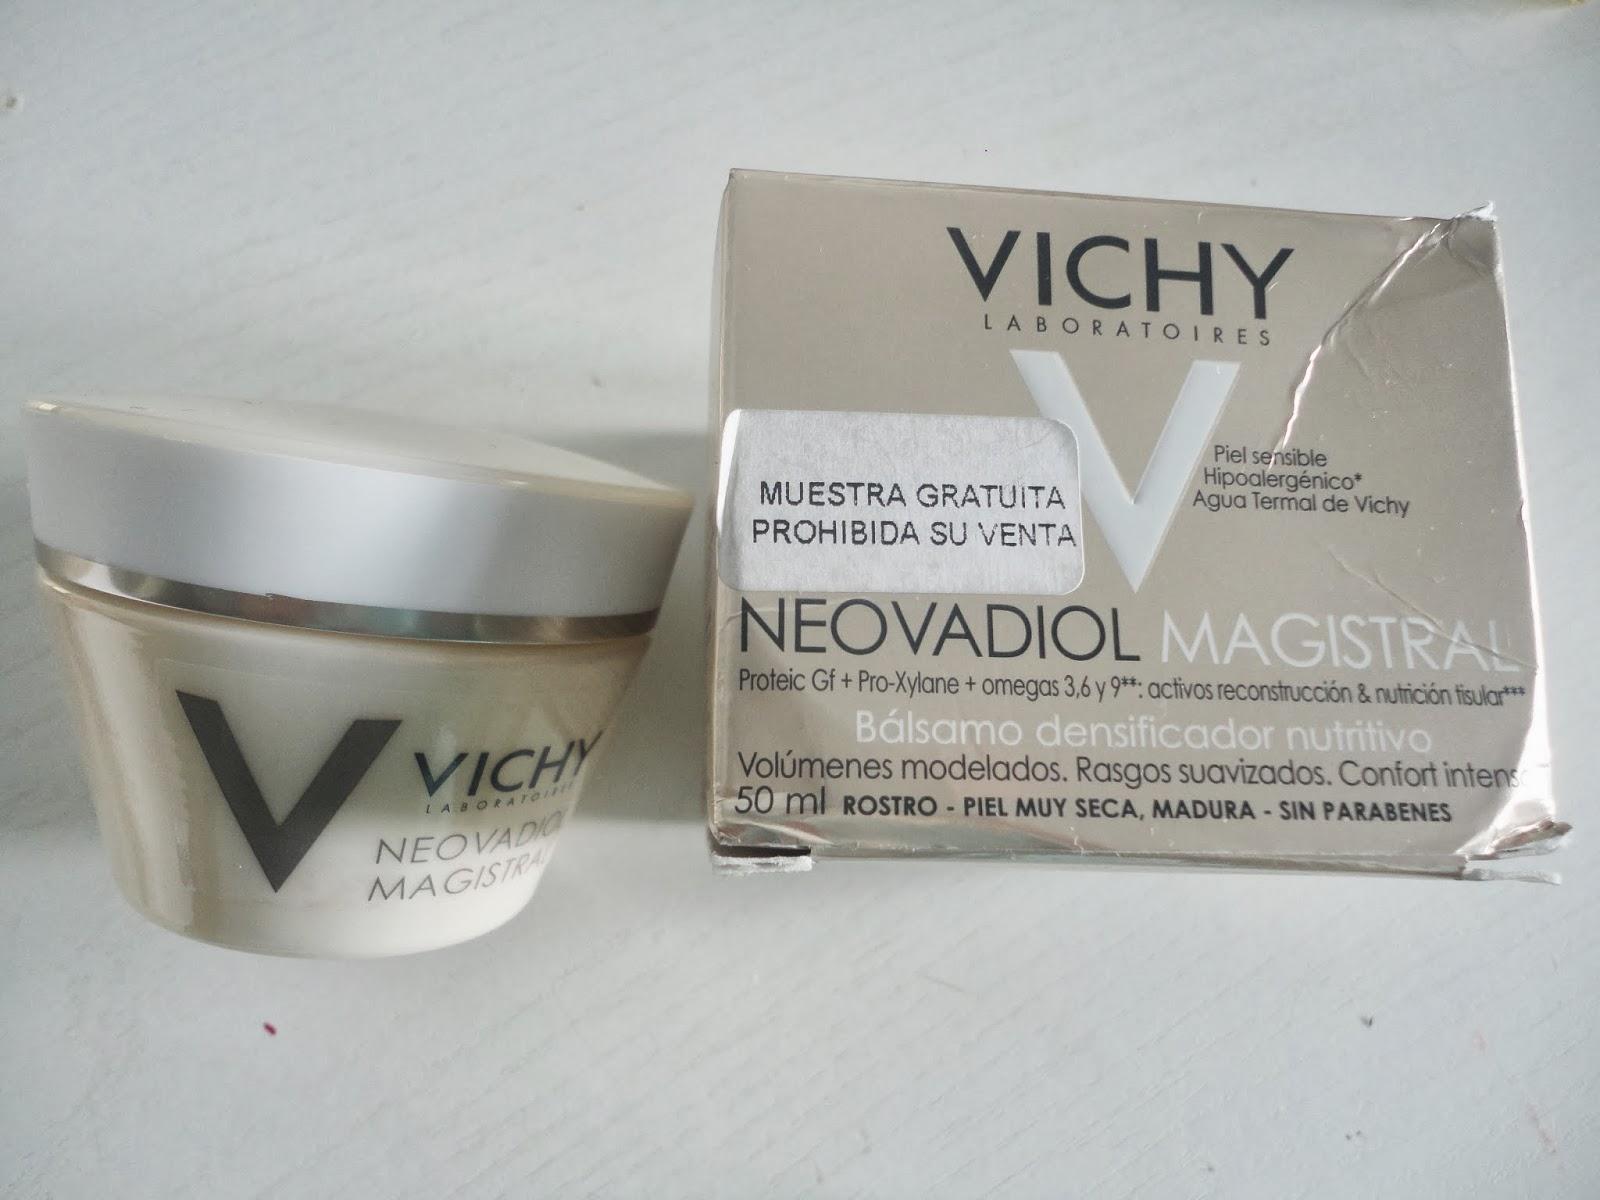 lpfbox-vichy-neovadiol-magistral